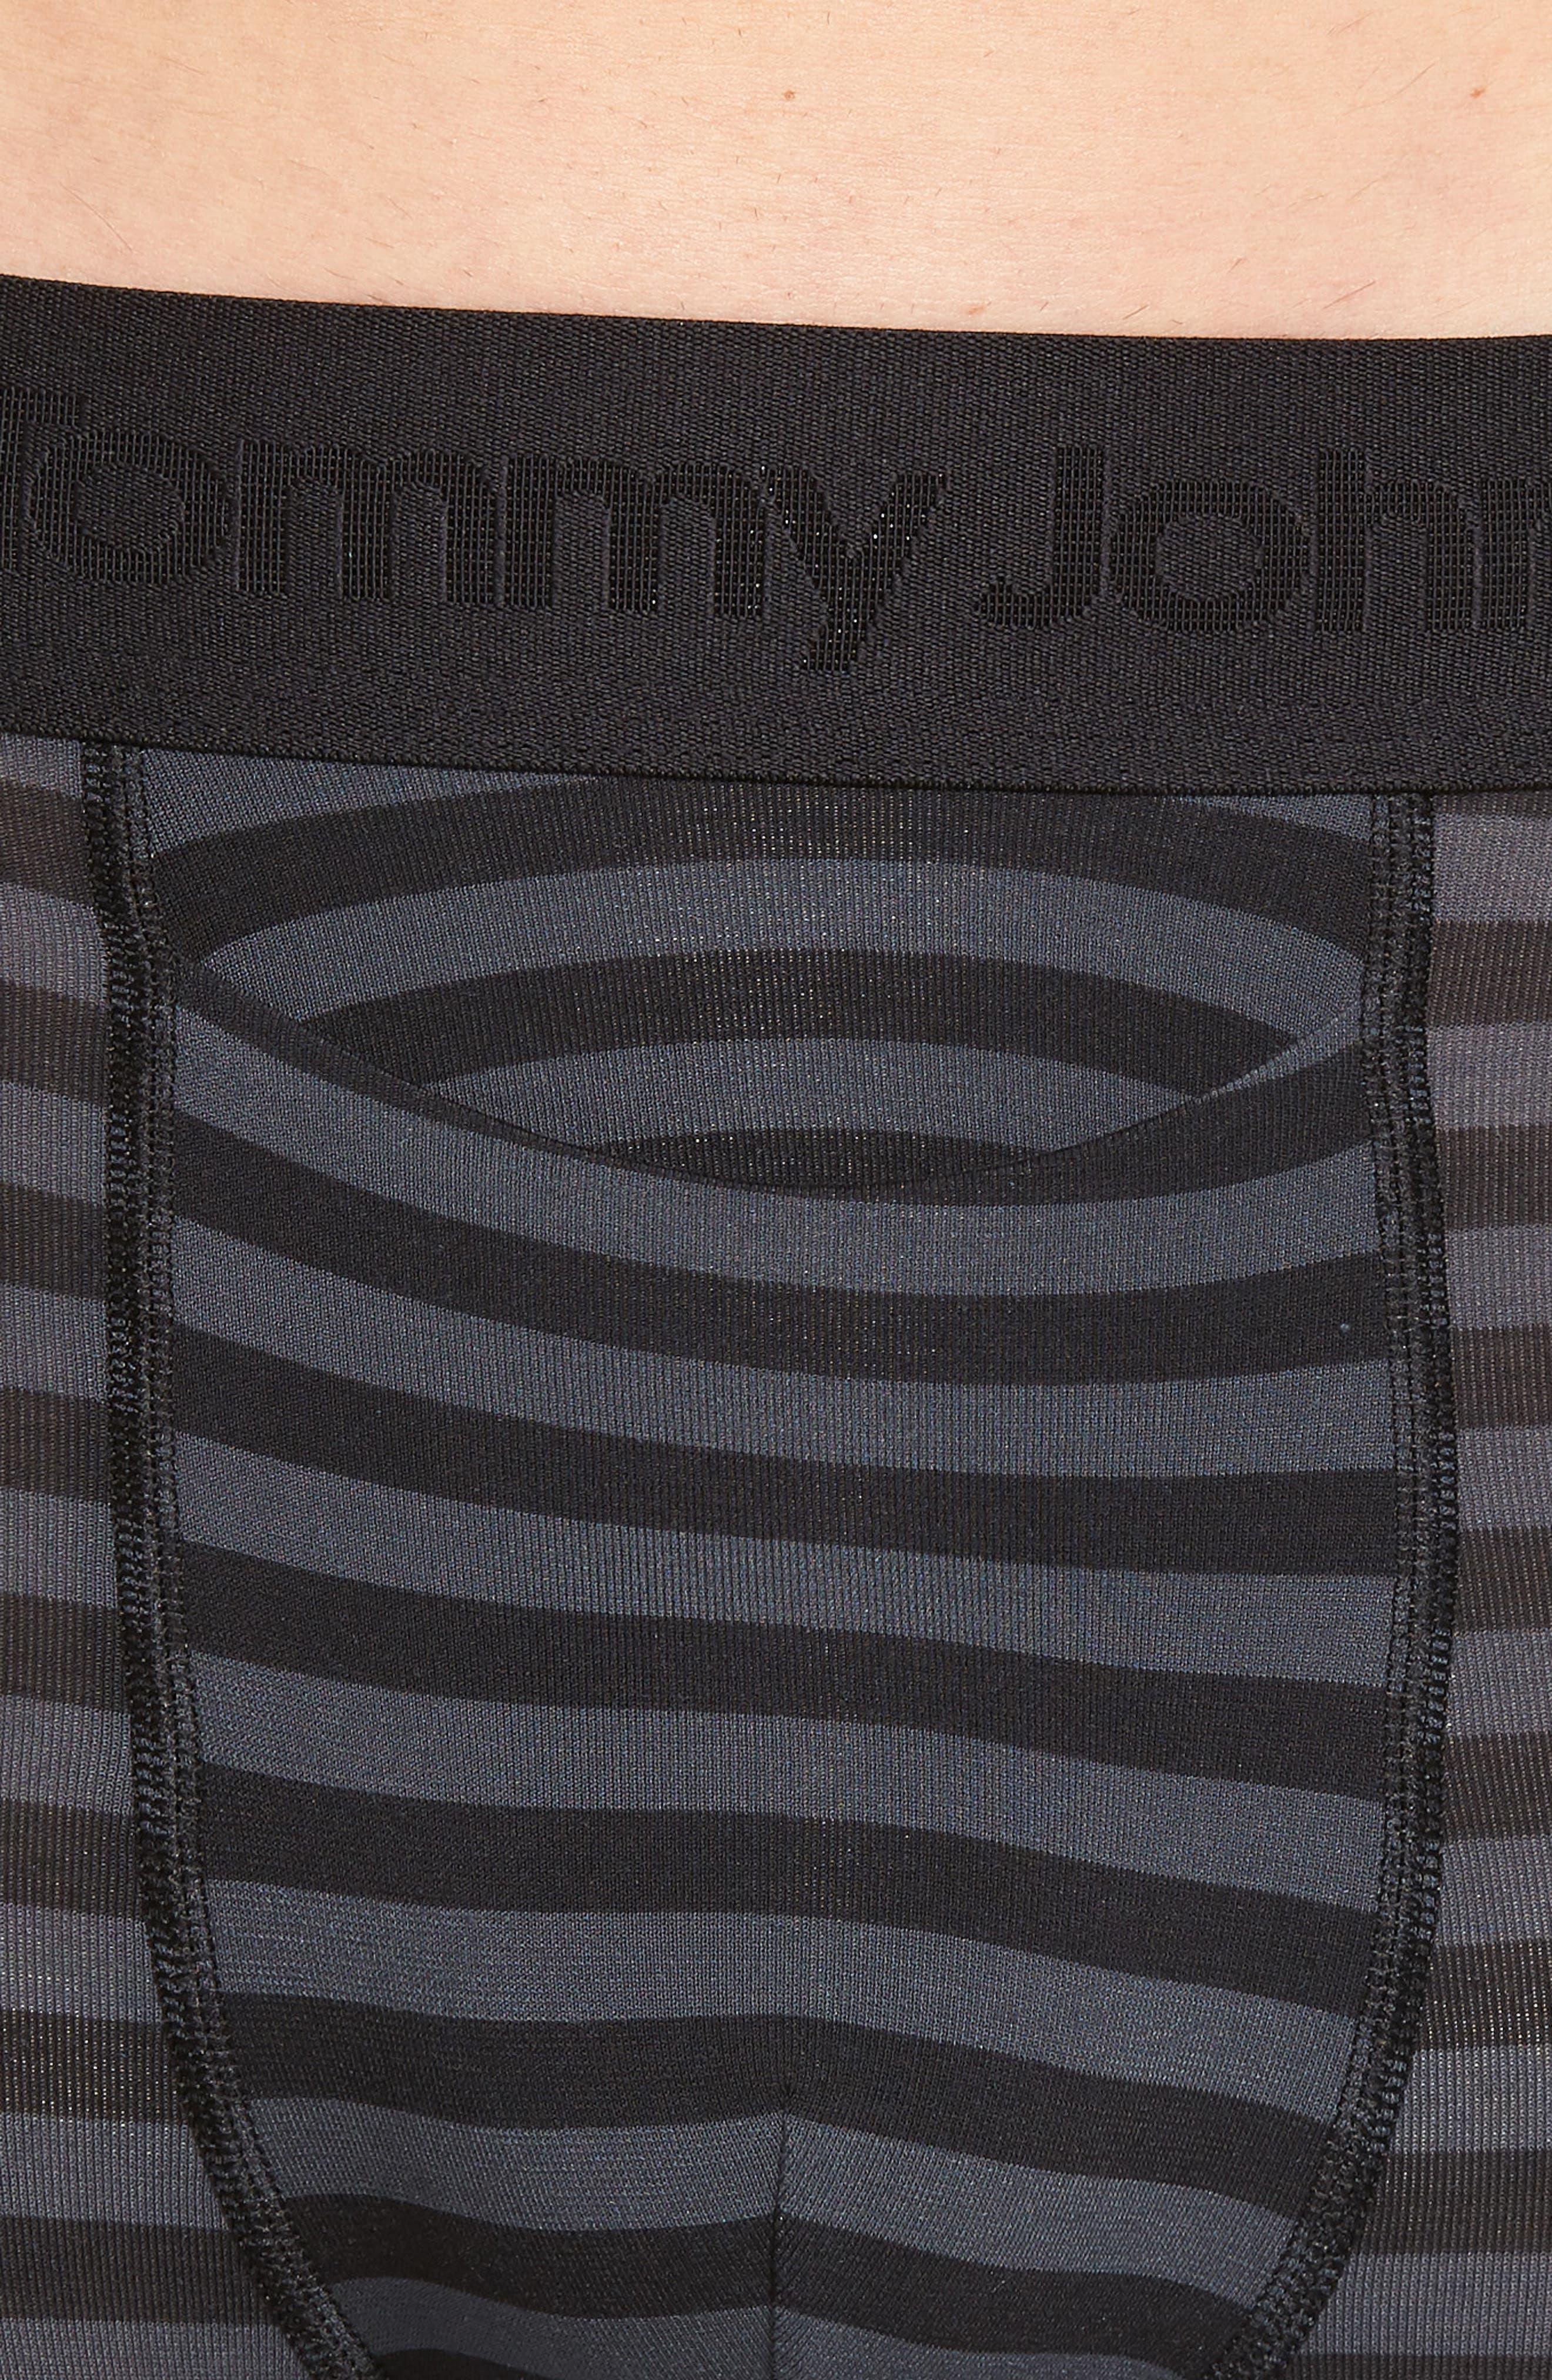 Second Skin Boxer Briefs,                             Alternate thumbnail 4, color,                             BLACK/ TURBULENCE